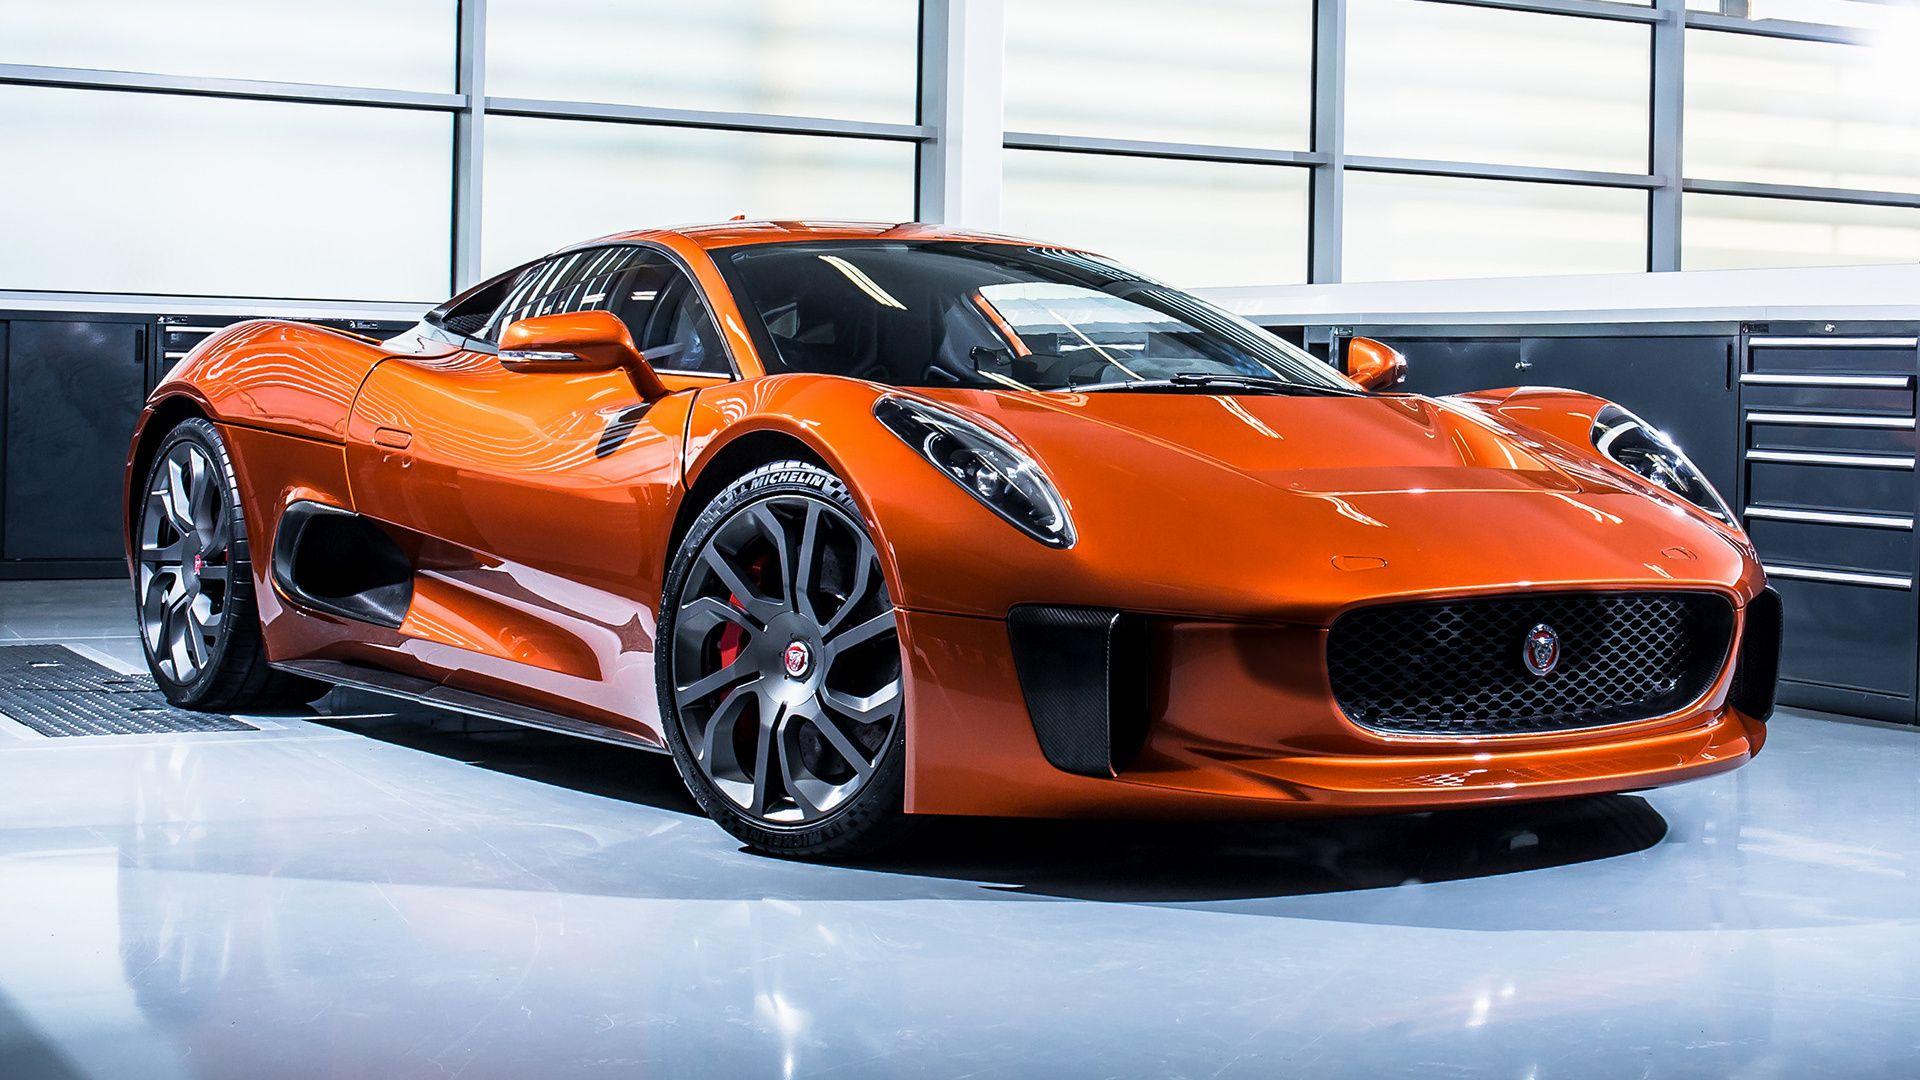 2015 Jaguar C X75 007 Spectre Bond Car Wallpapers Hd